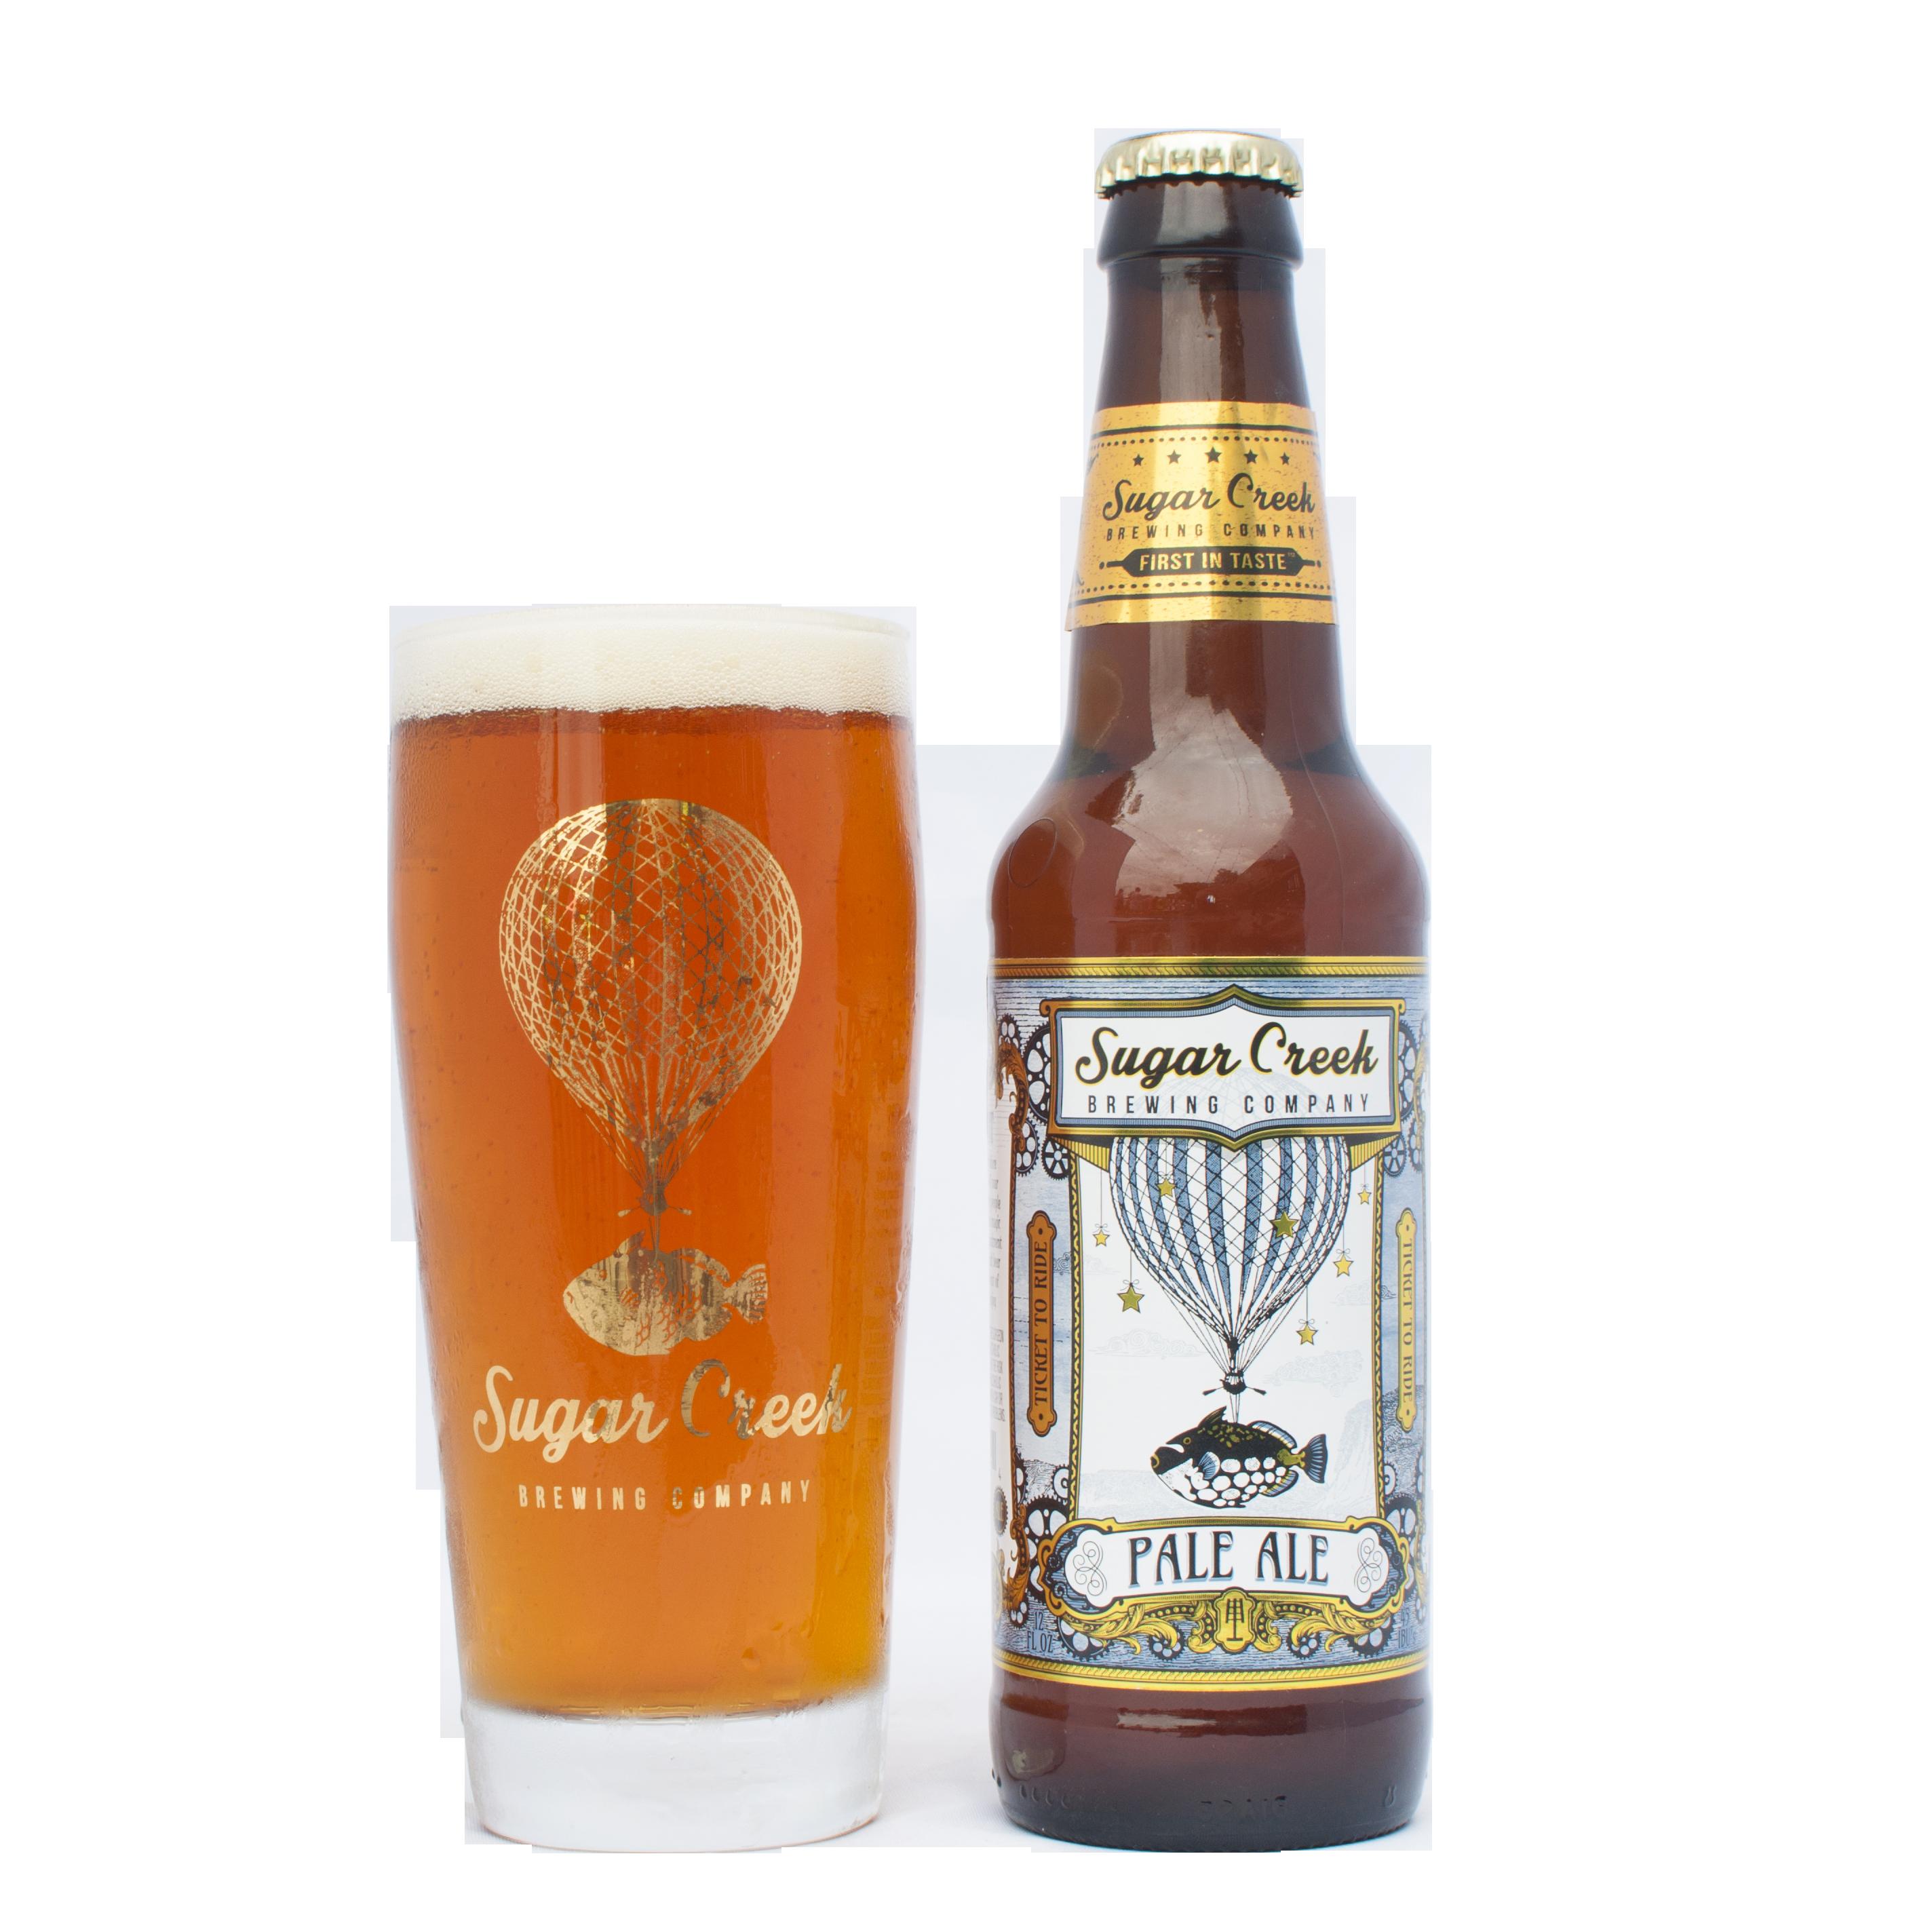 Drinking clipart craft beer bottle. Sugar creek brewing list